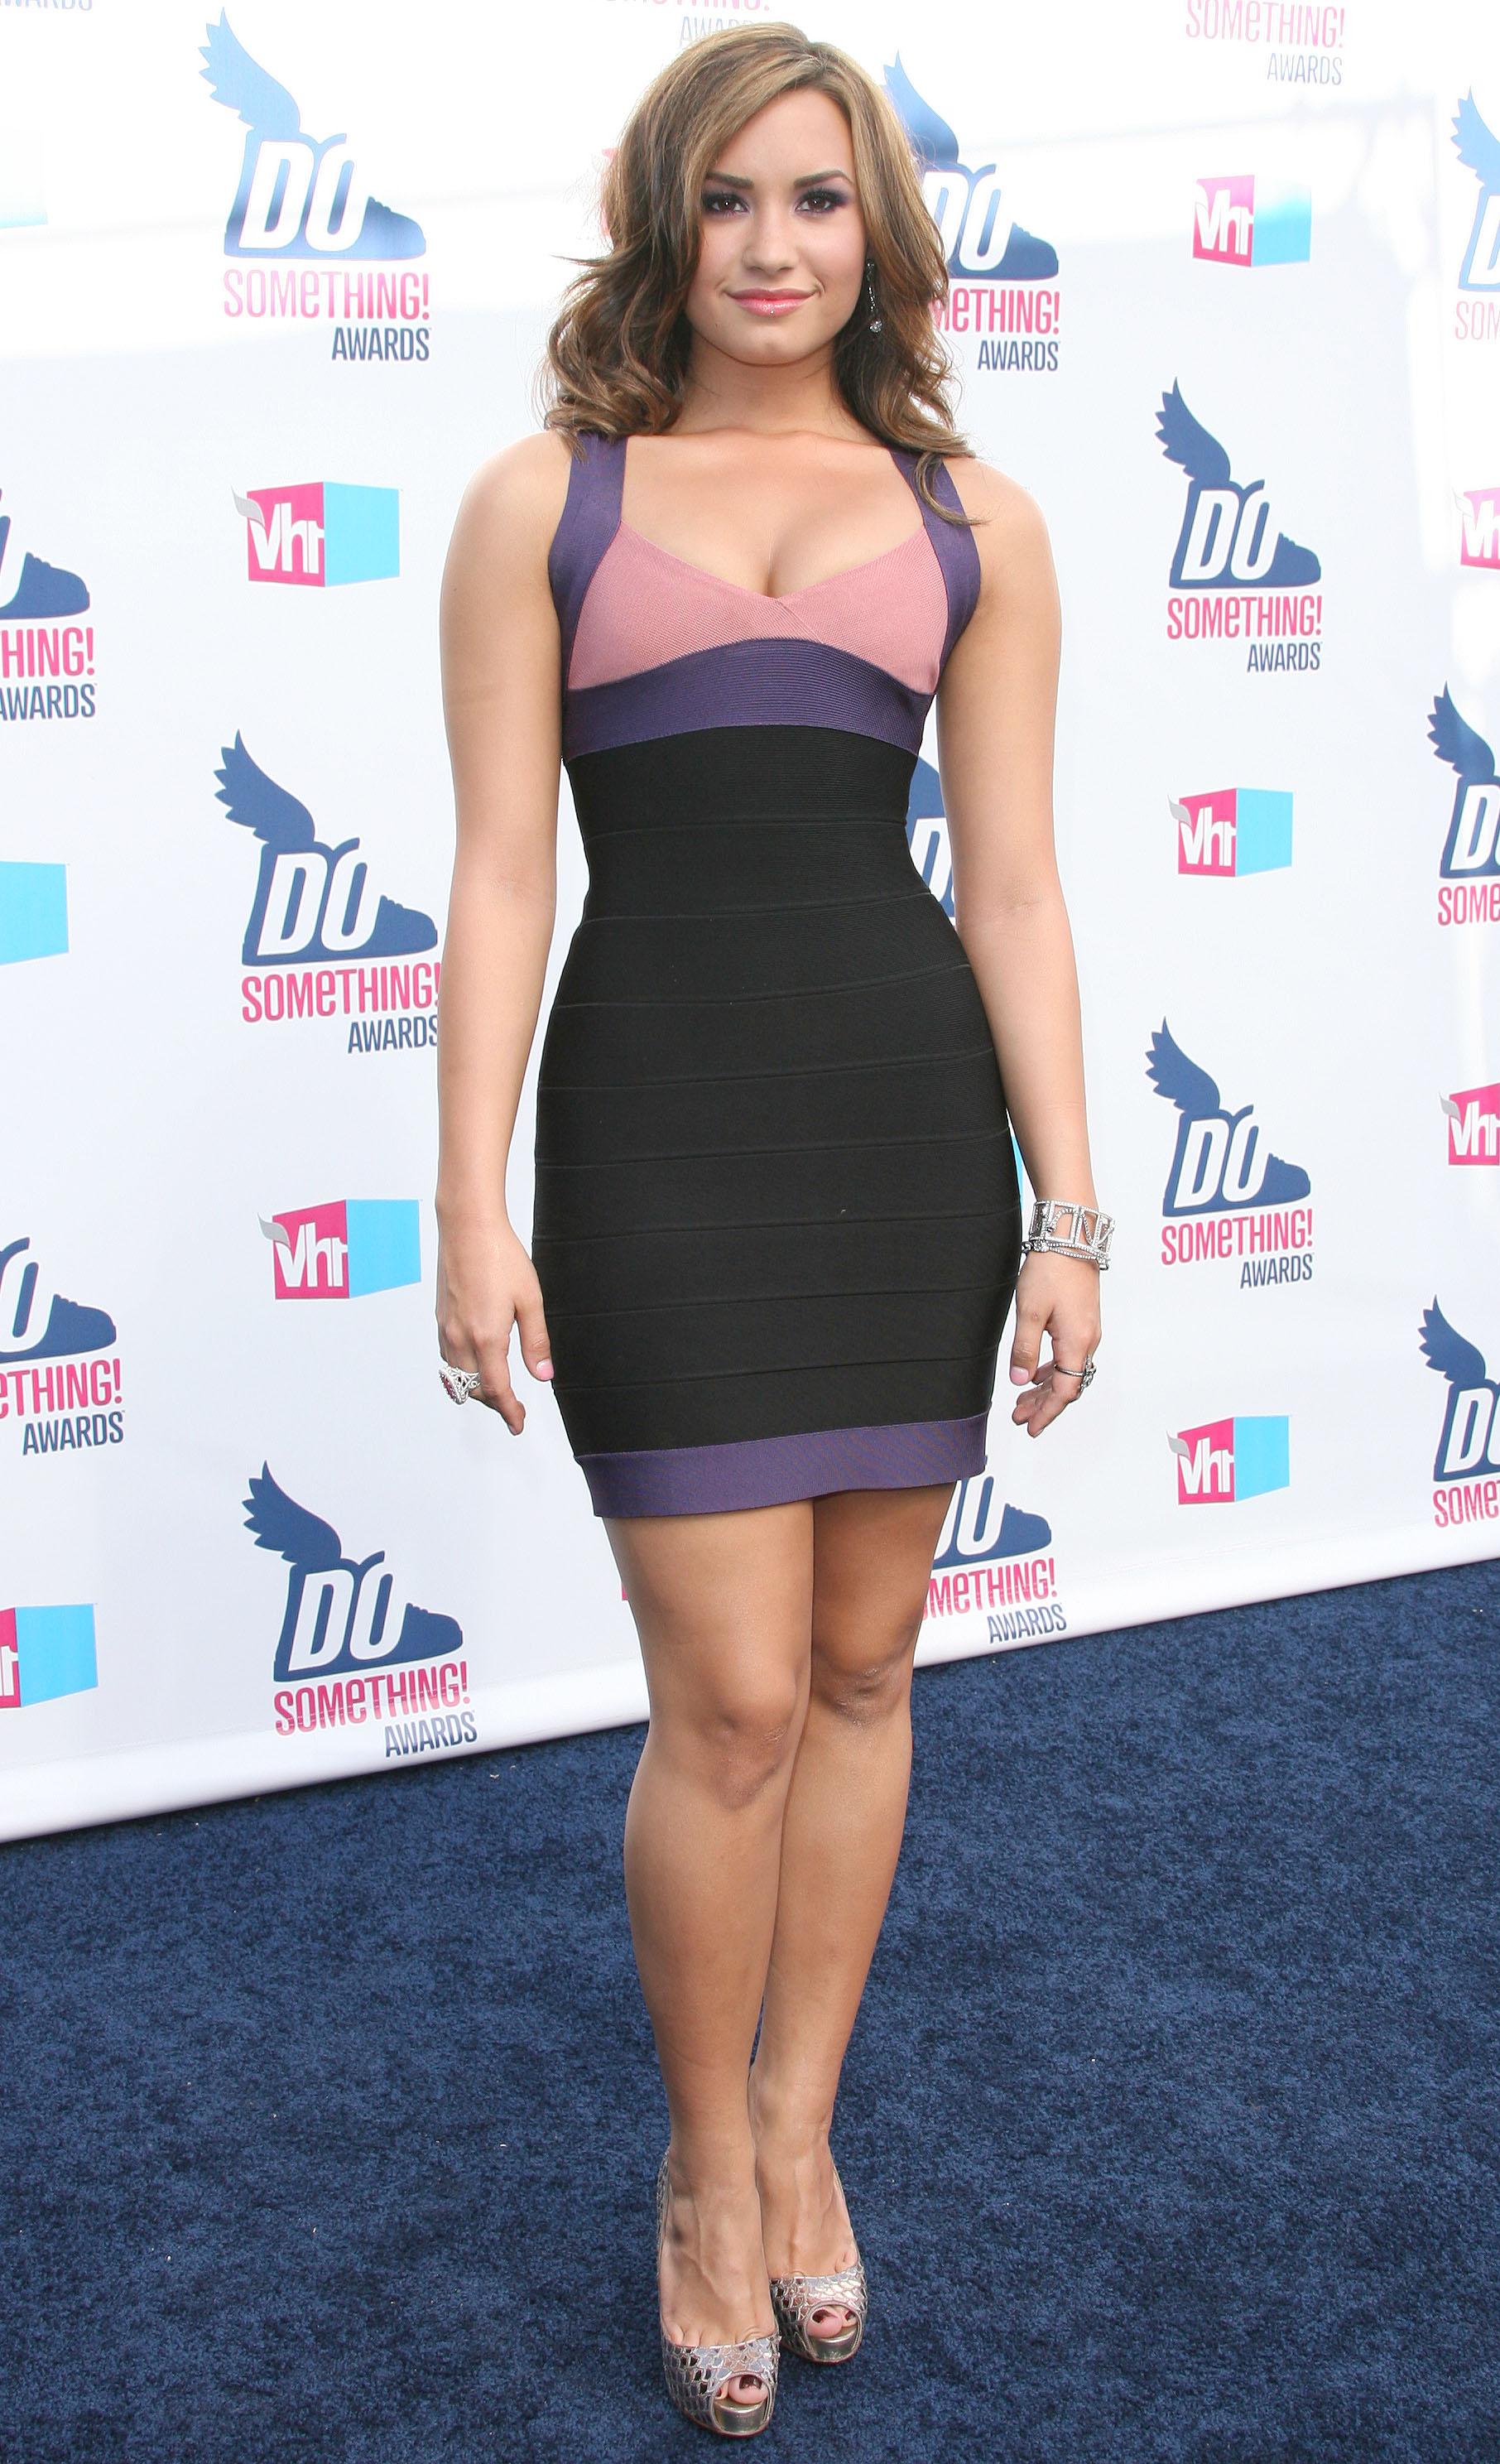 27953_Demi_Lovato_2010_VH1_Do_Something_Awards6_122_148lo.jpg